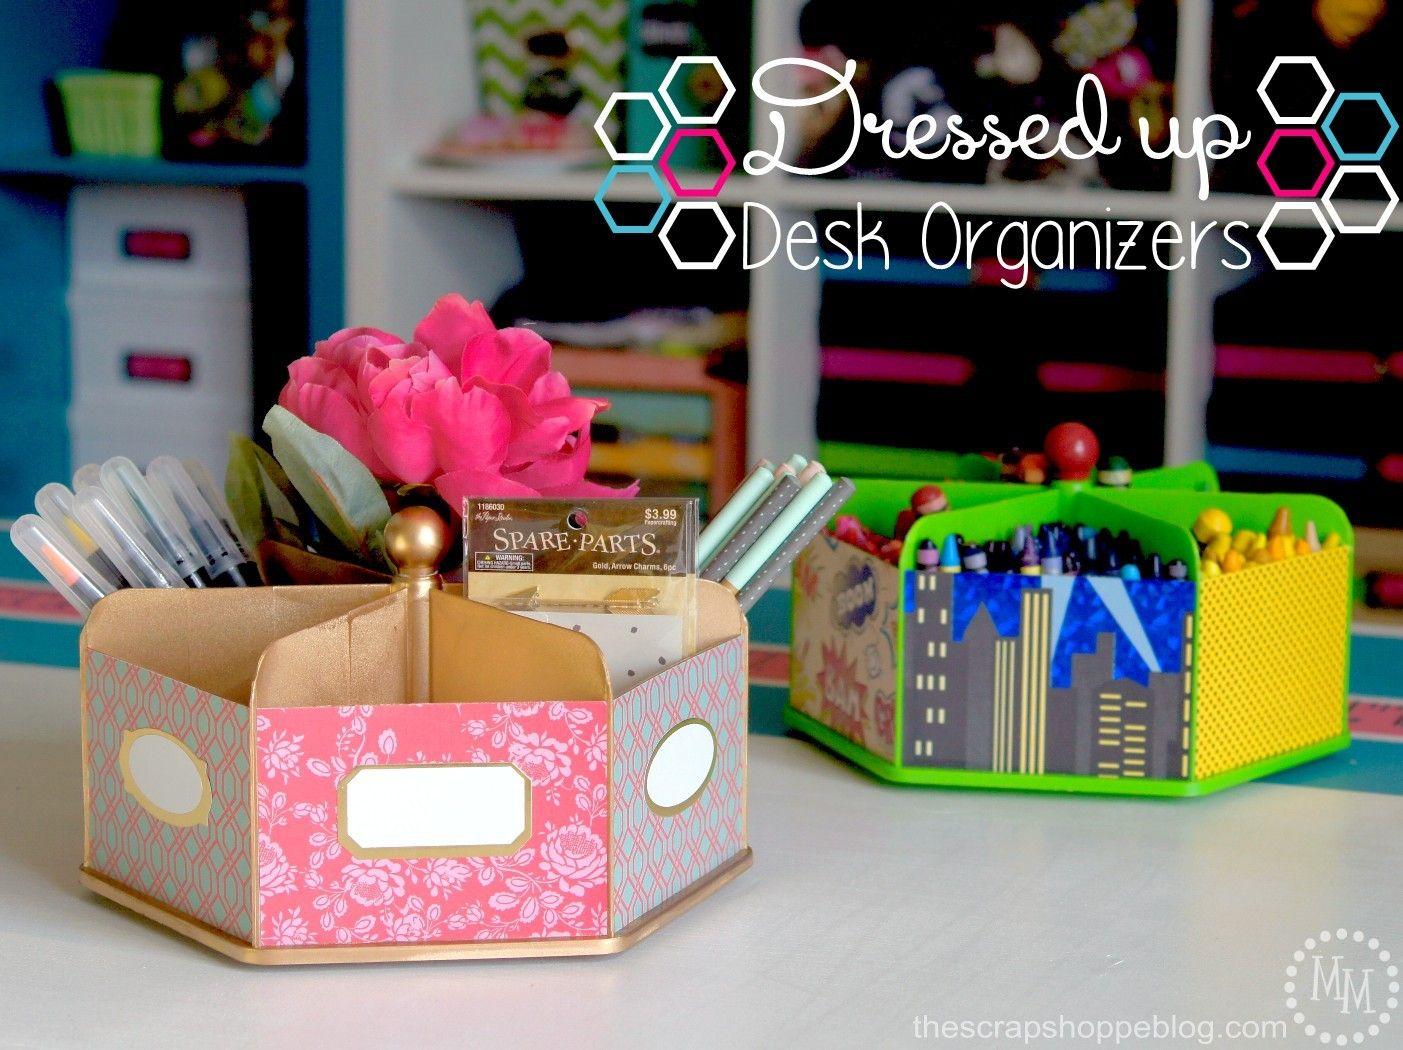 Phenomenal Dress Up Desk Organizers Target Dollar Spot Organizers Home Interior And Landscaping Ologienasavecom